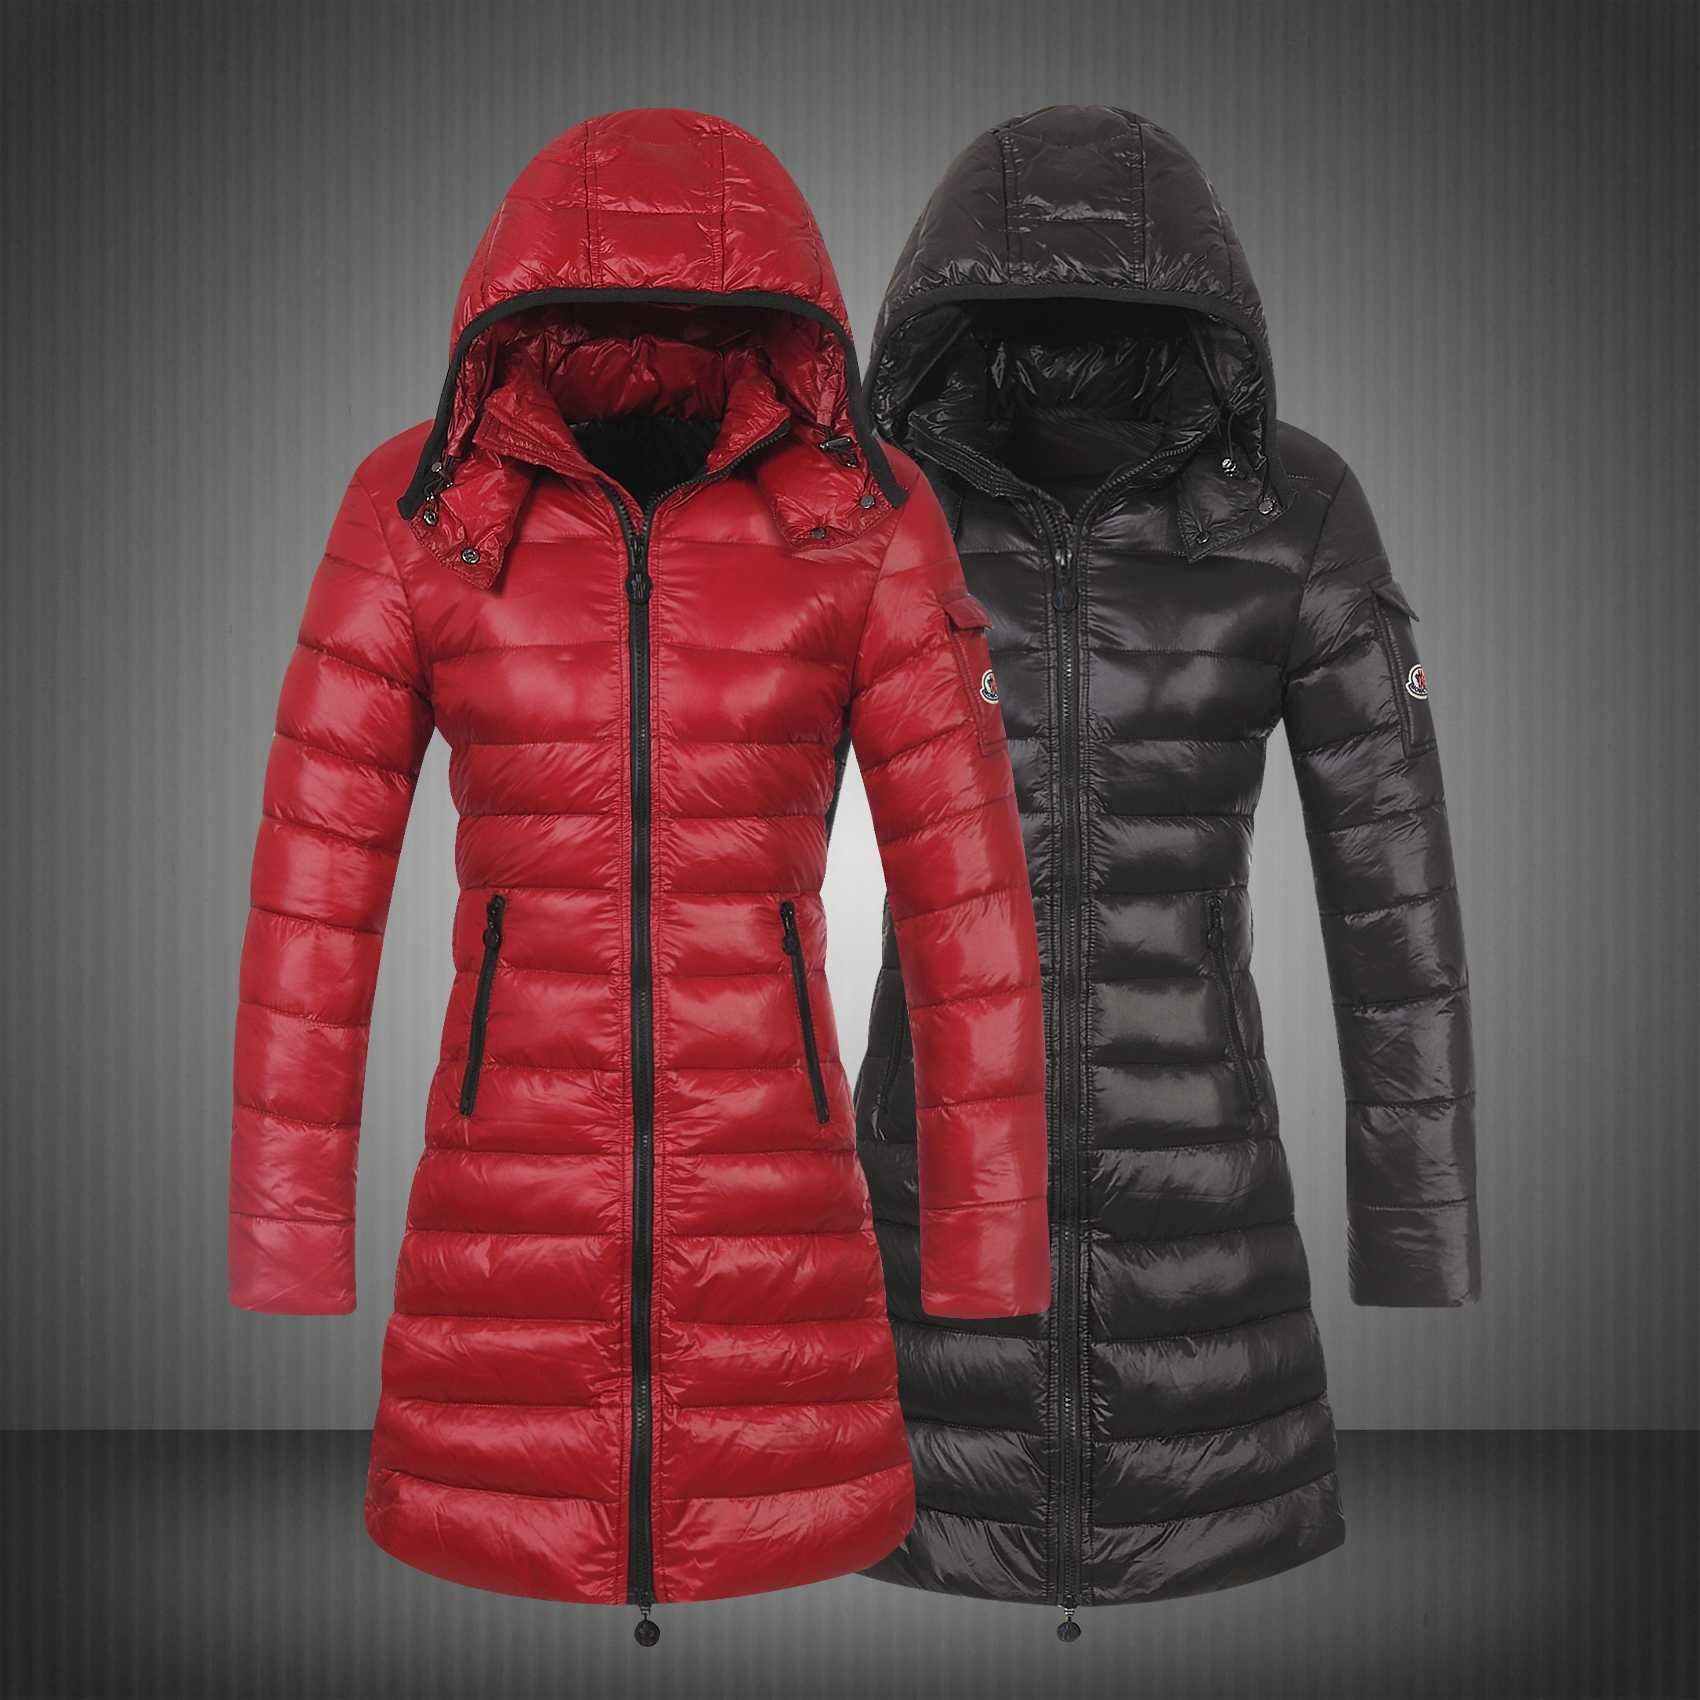 Moncler Mens Ski Jacket, Mens Moncler Vest Discount Sale